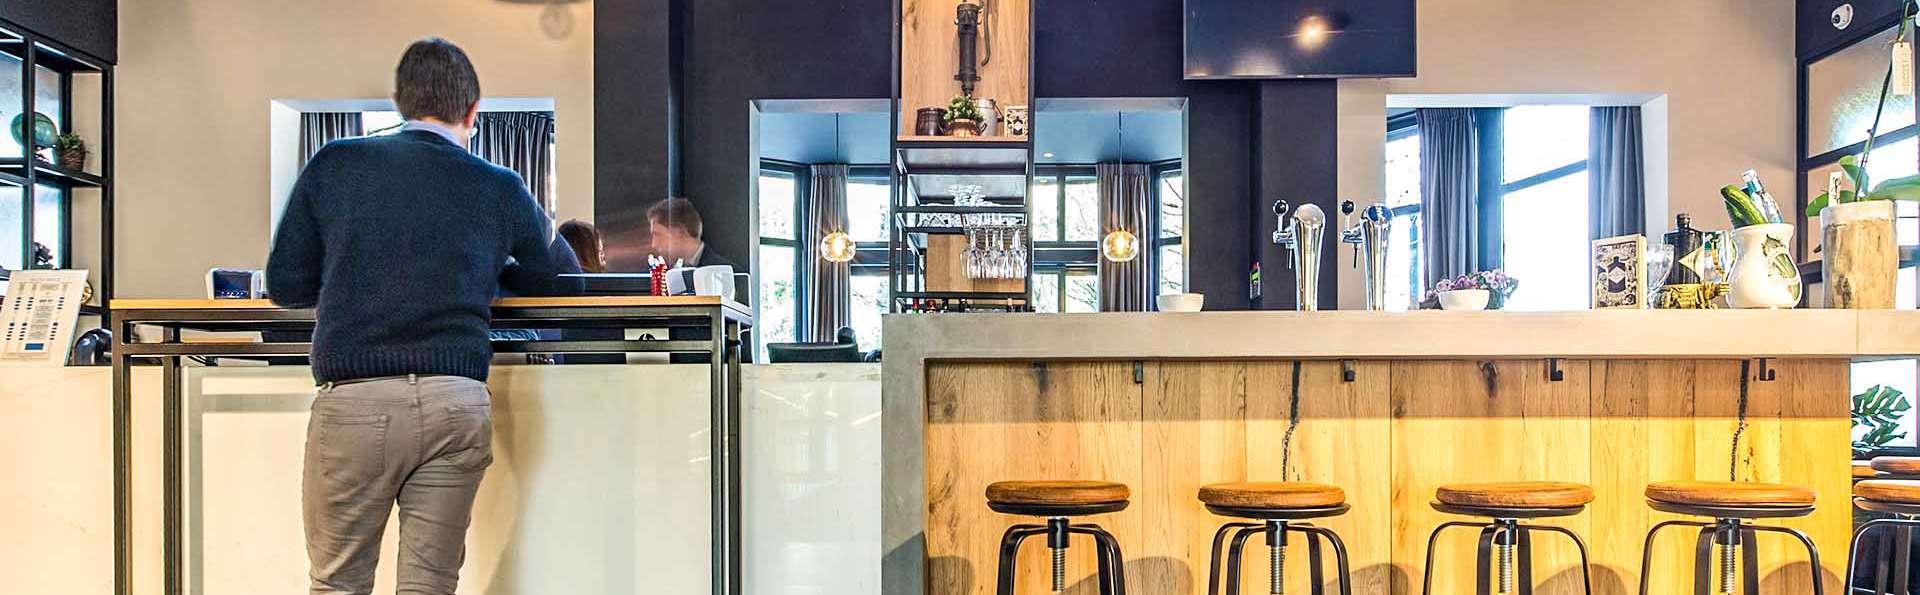 Park Inn by Radisson Brussels Airport - EDIT_Park_Inn_by_Radisson_Brussels_Airport_05.jpg